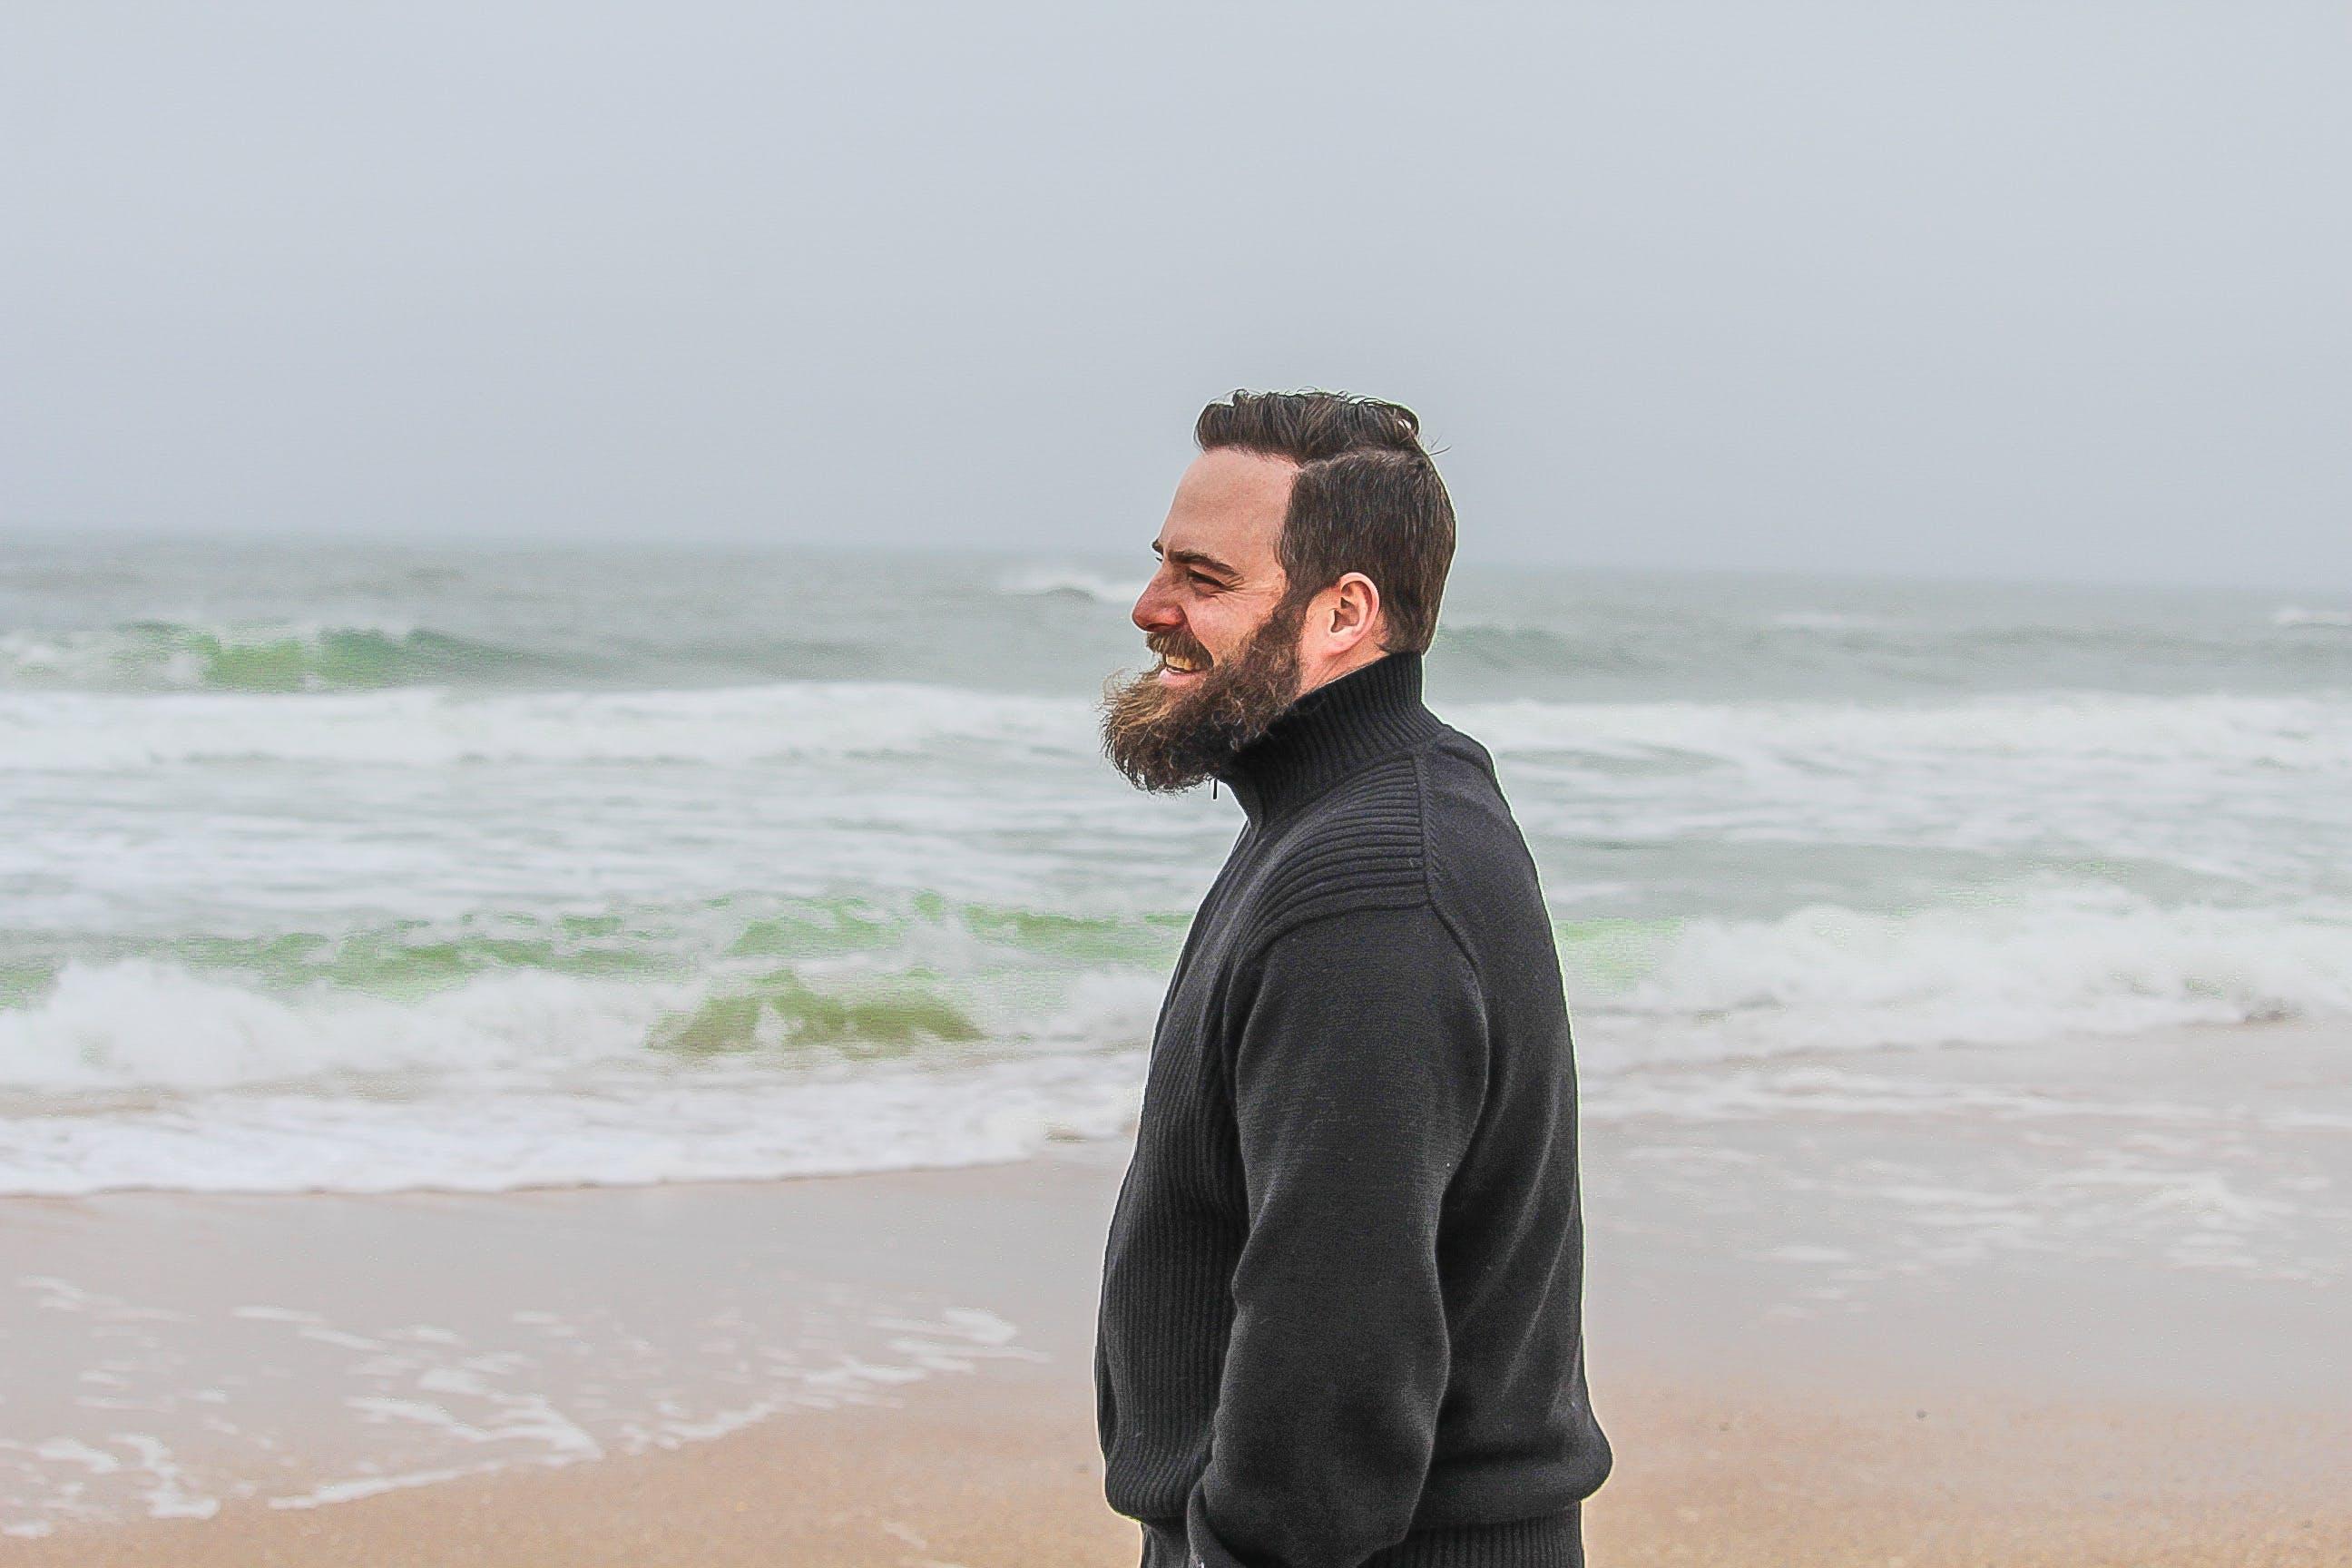 Man in Black Turtle-neck Jacket Standing on Shore